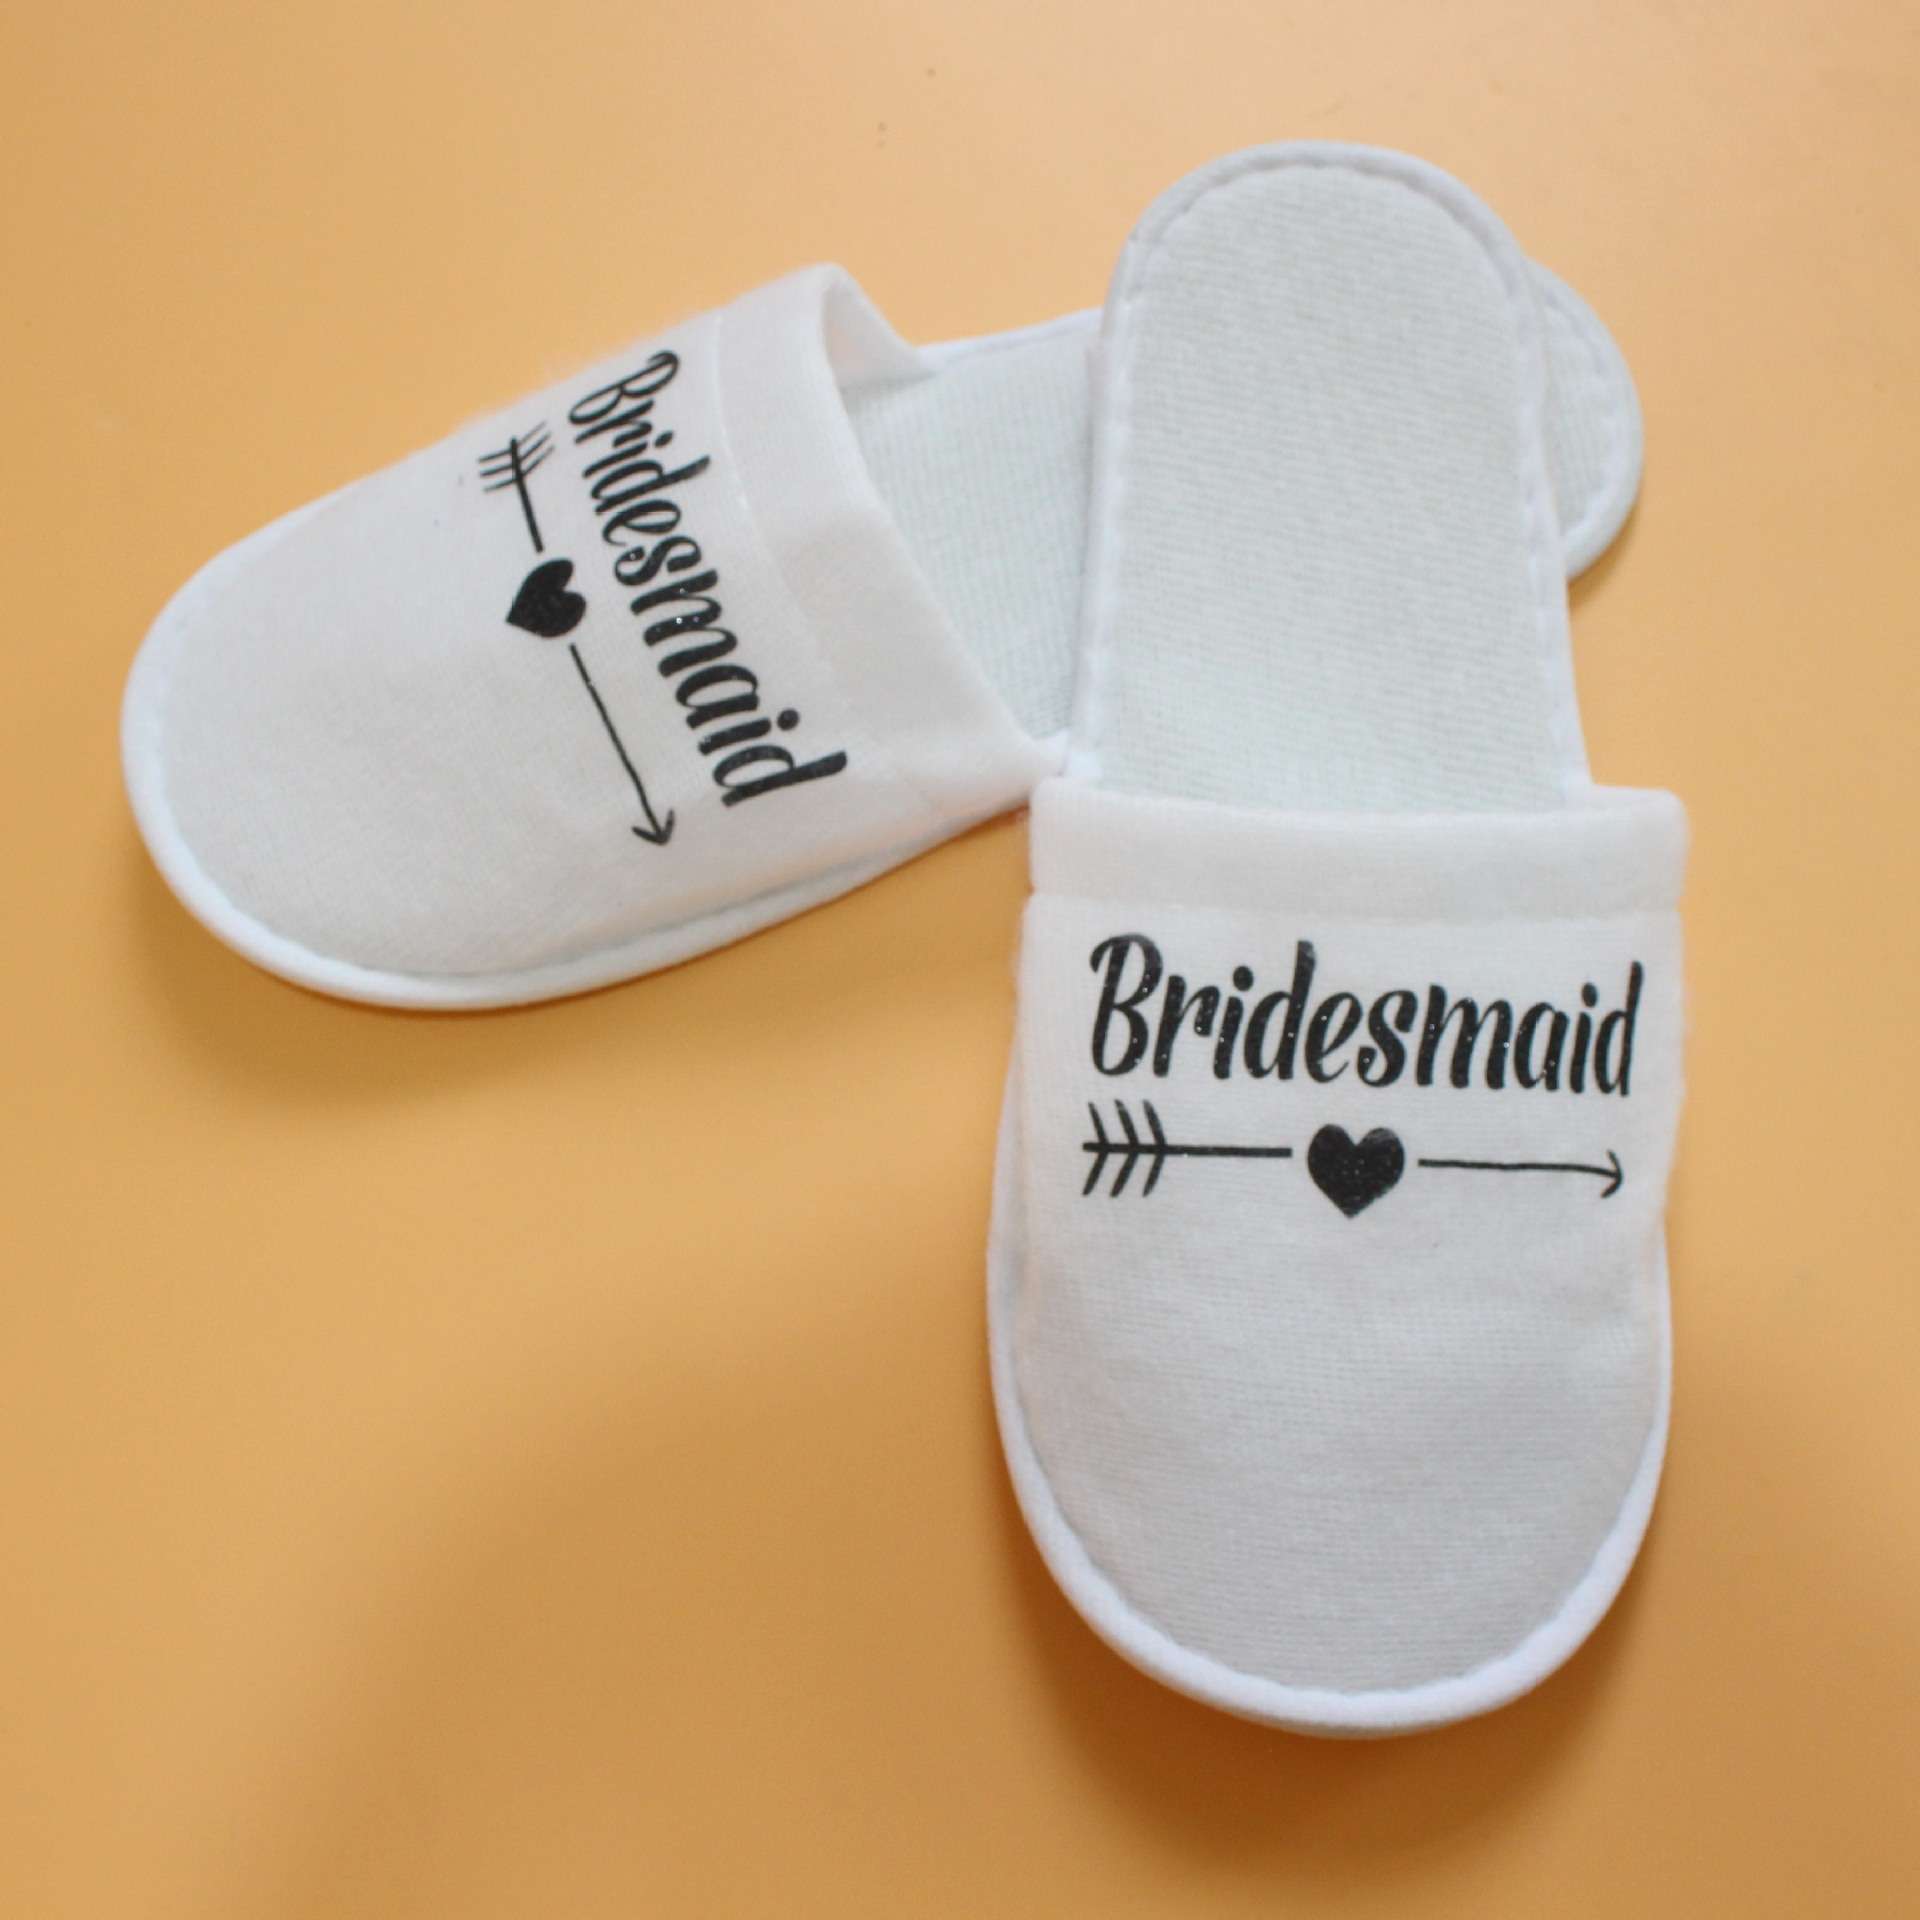 Bridemaid black